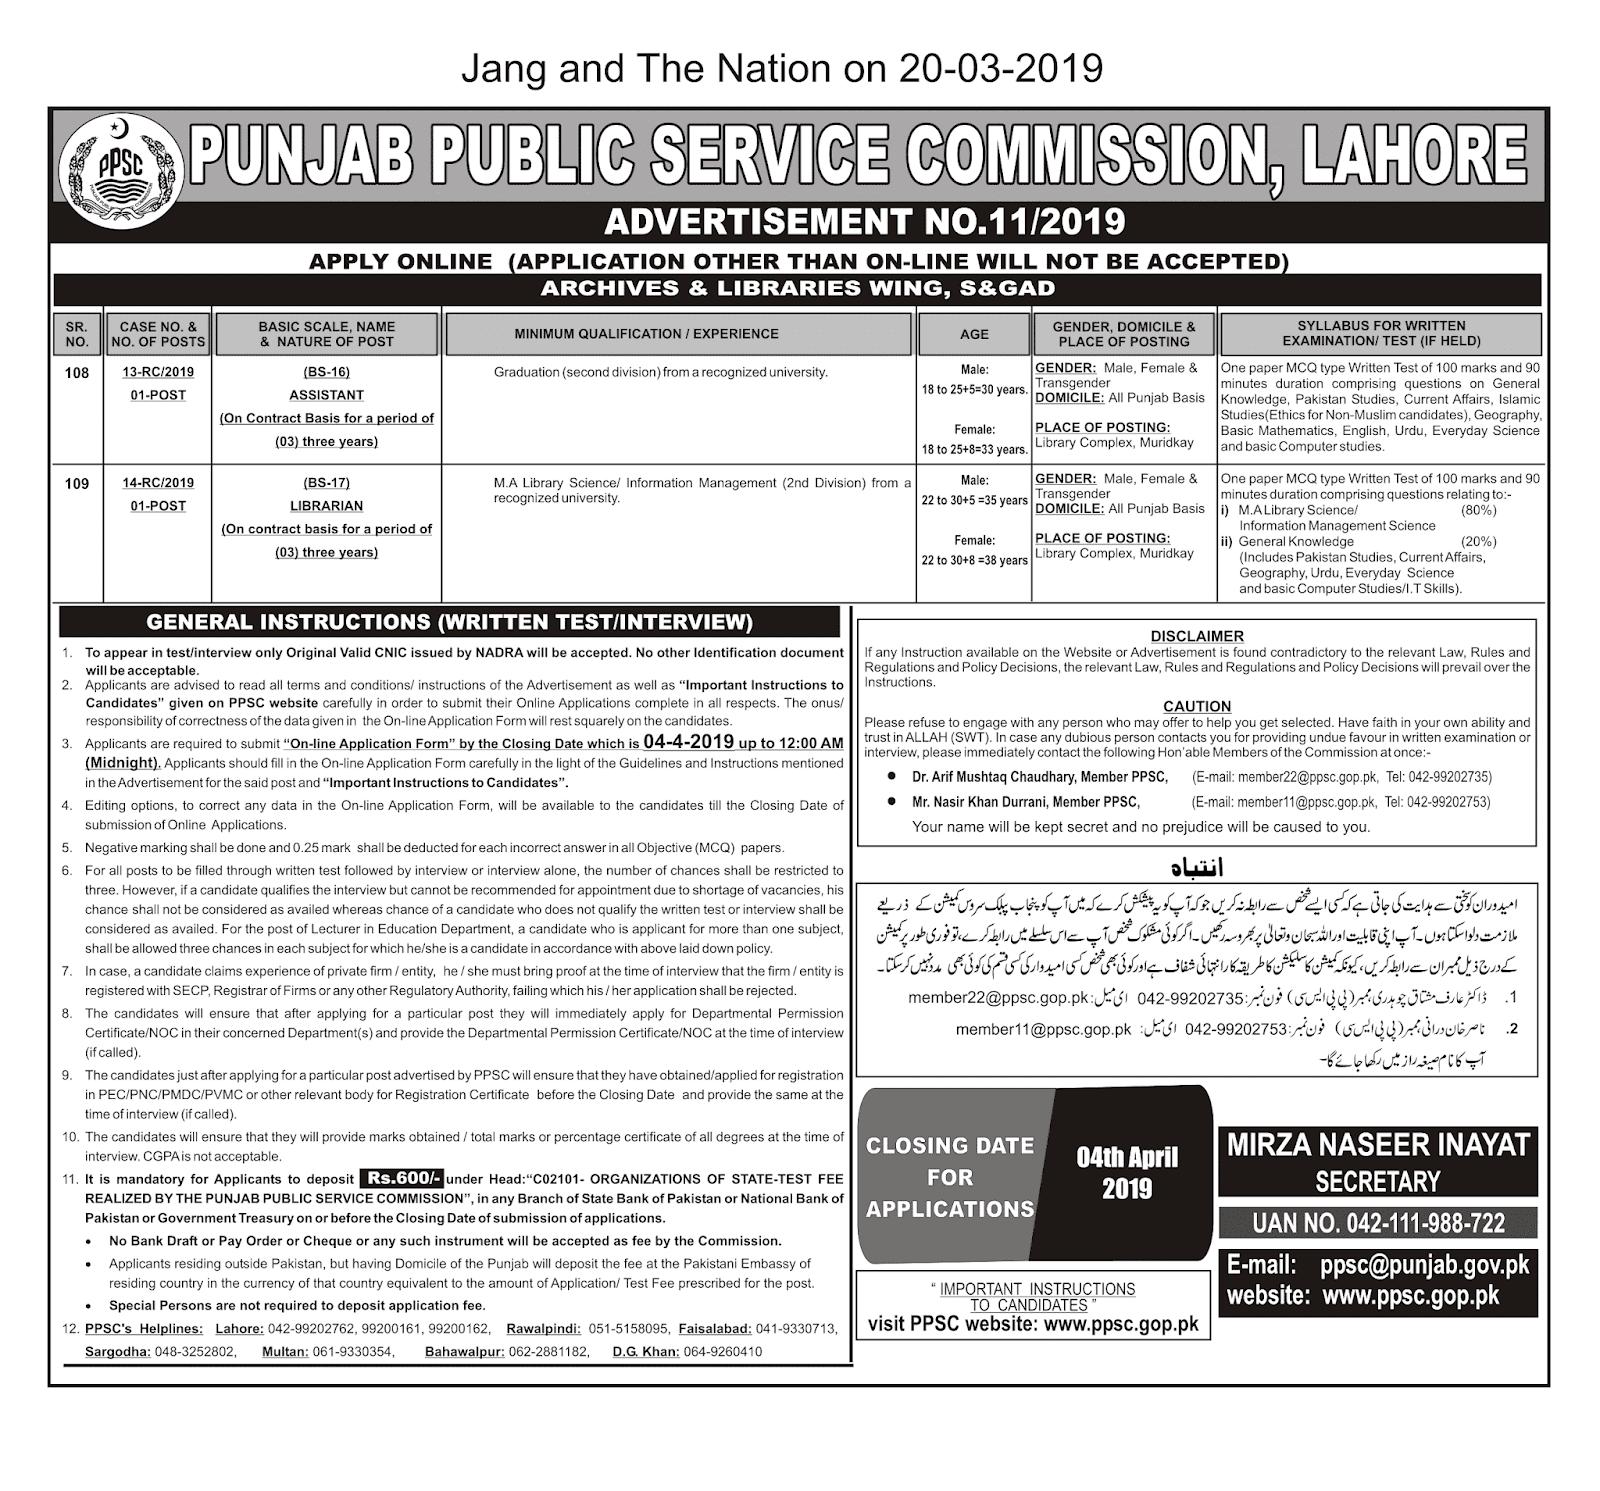 PPSC Advertisement 11/2019